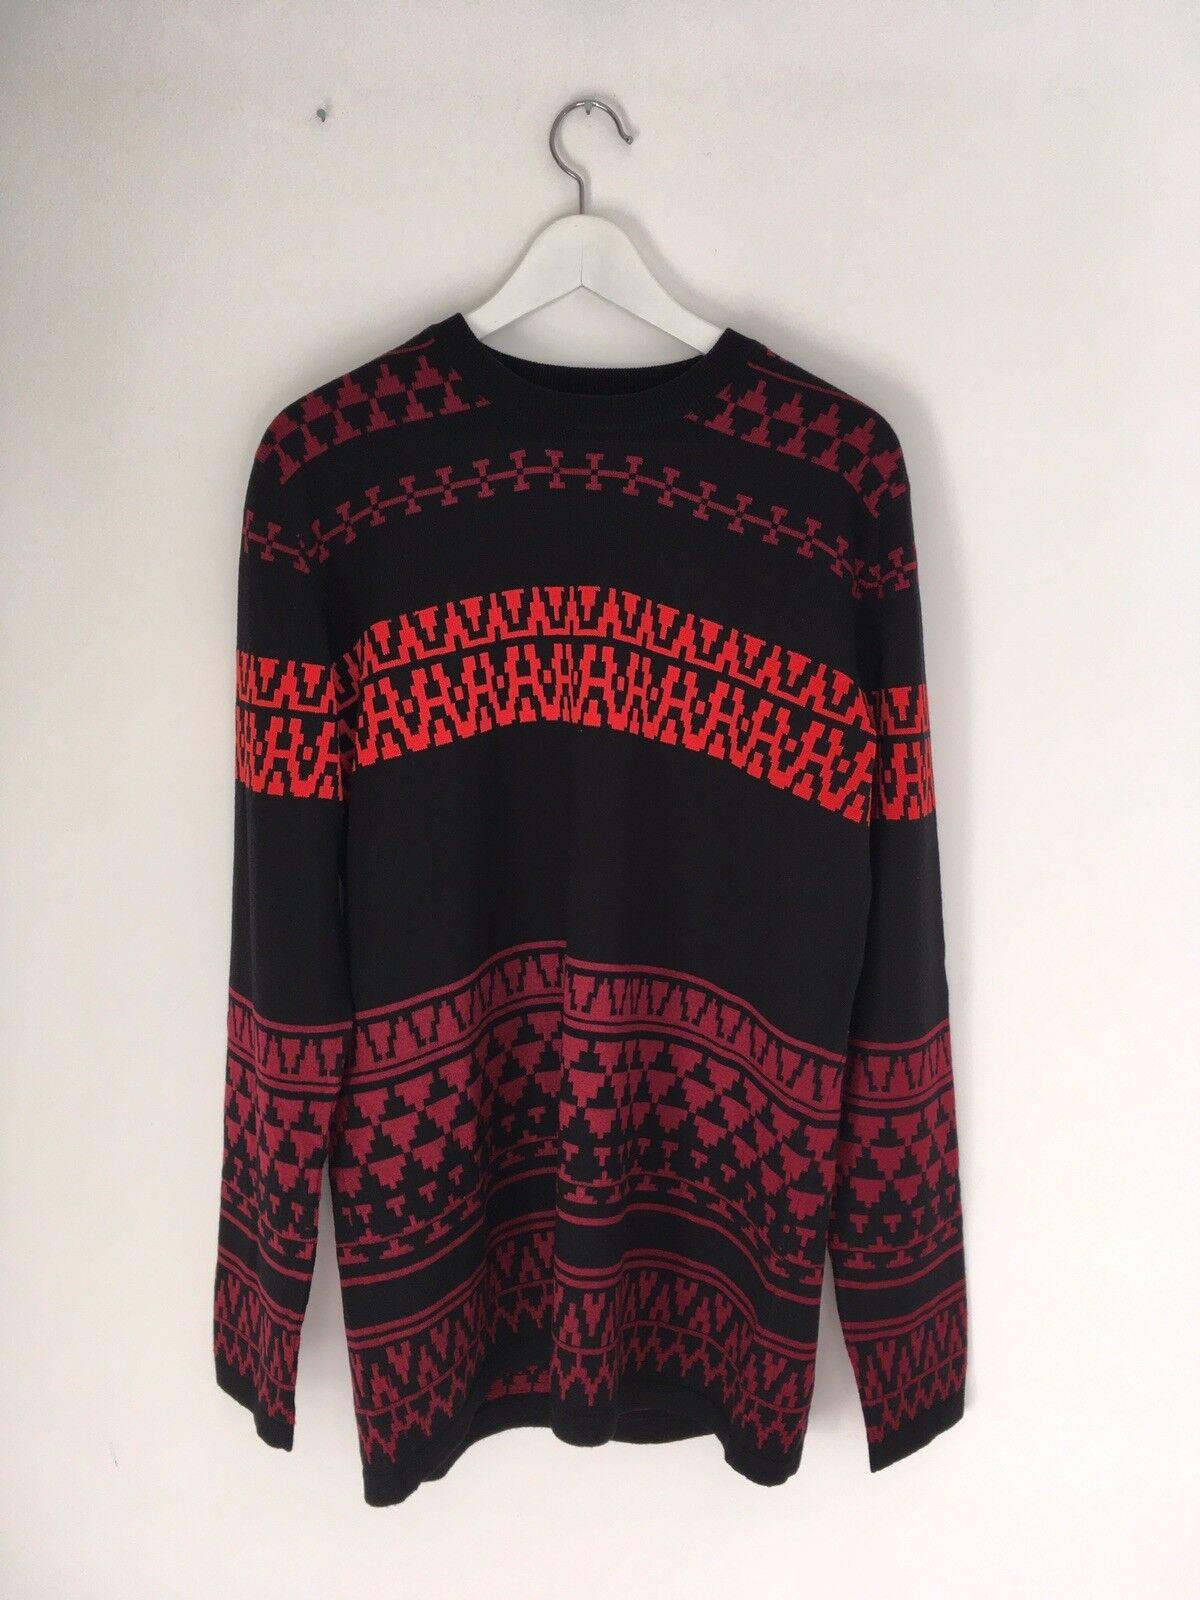 McQ Alexander McQueen • Mens Knitwear Jumper • 100% Wool • Größe L • Brand NEW